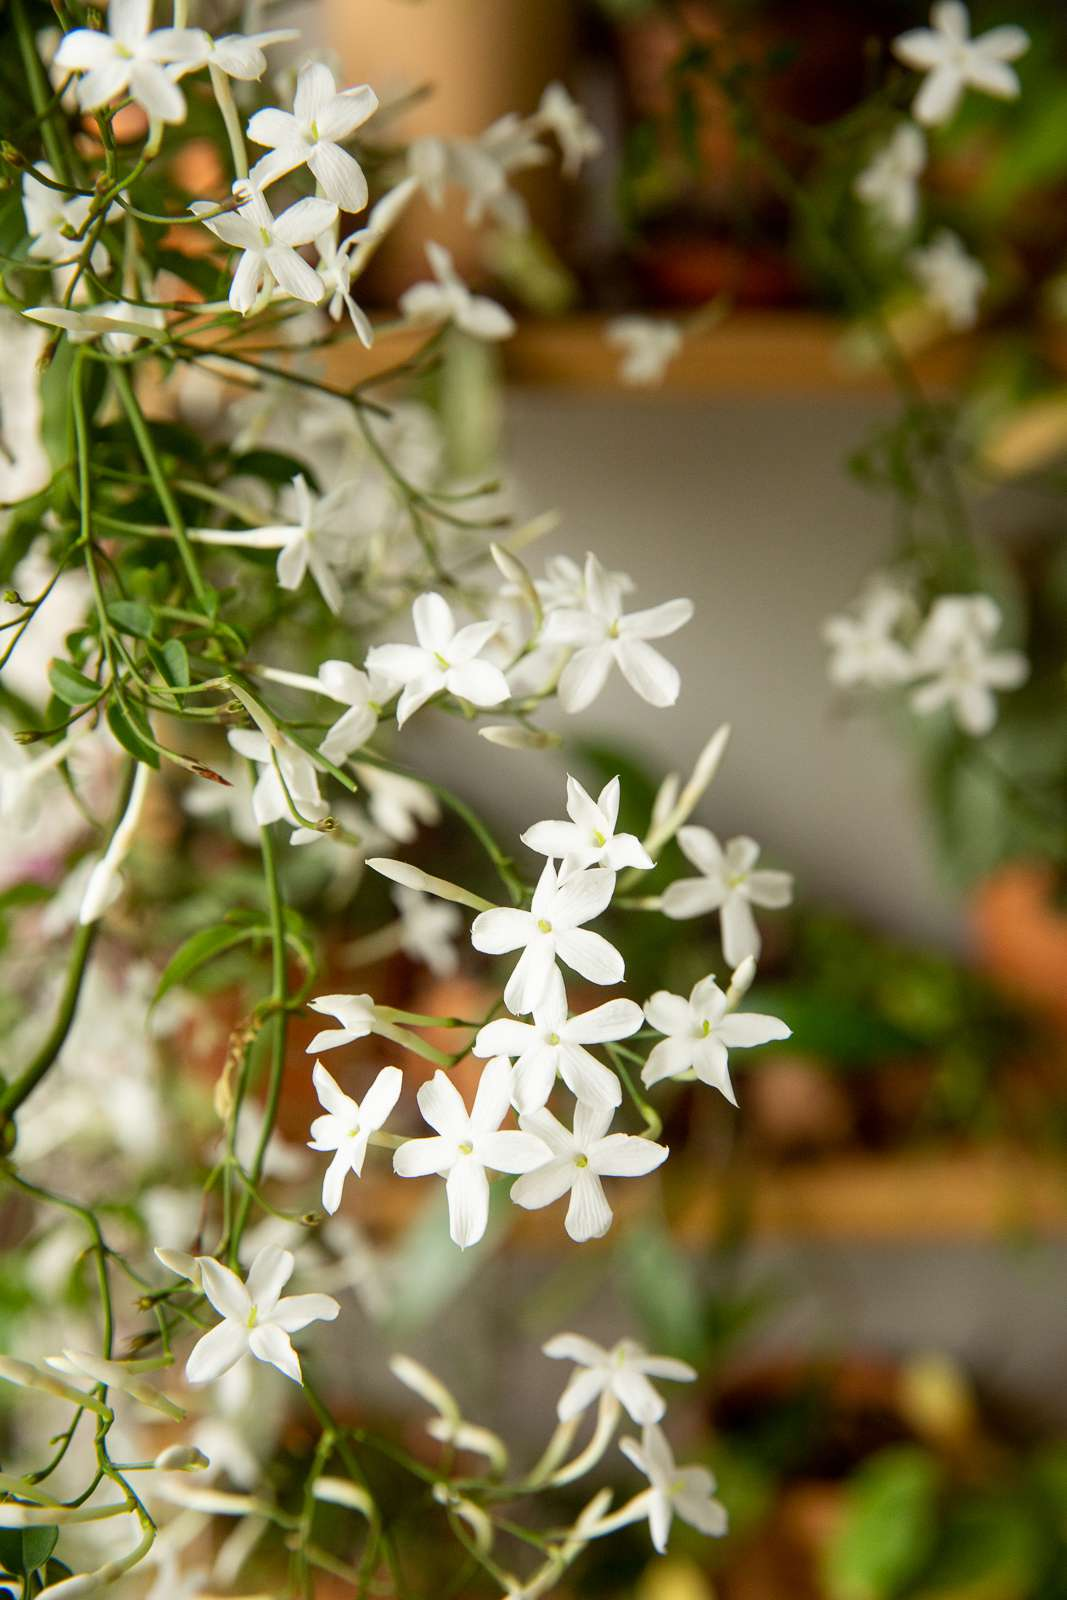 Vining jasmine with flowers closeup